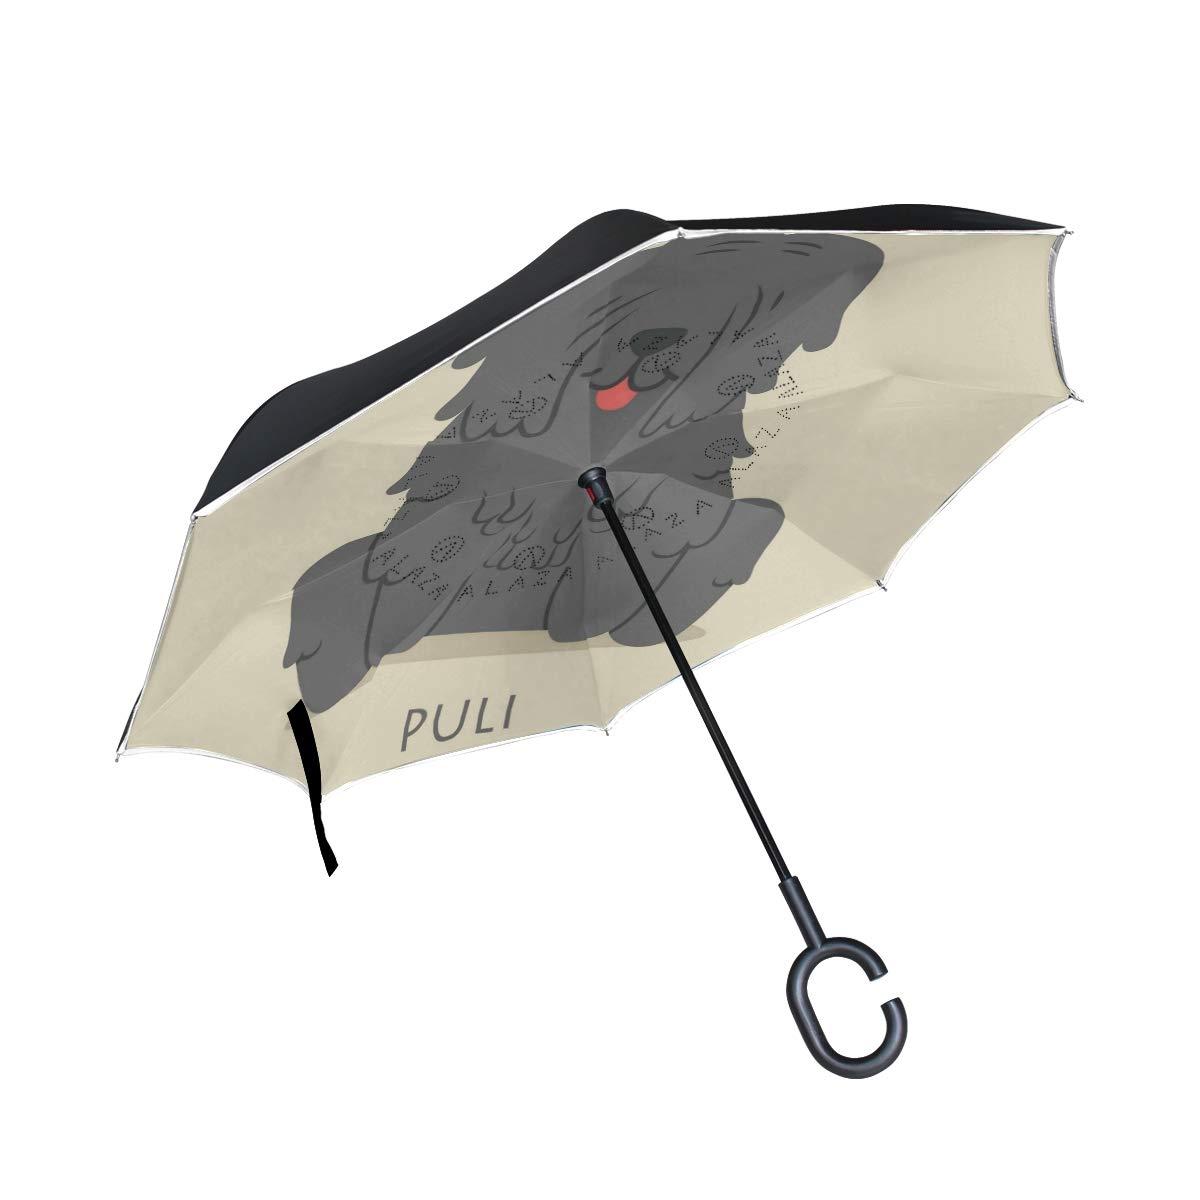 ONELUCA プーリ犬 車 リバースゴルフ傘 二層逆折り傘 C型ハンドル アウトドア旅行用   B07S4M7G1K